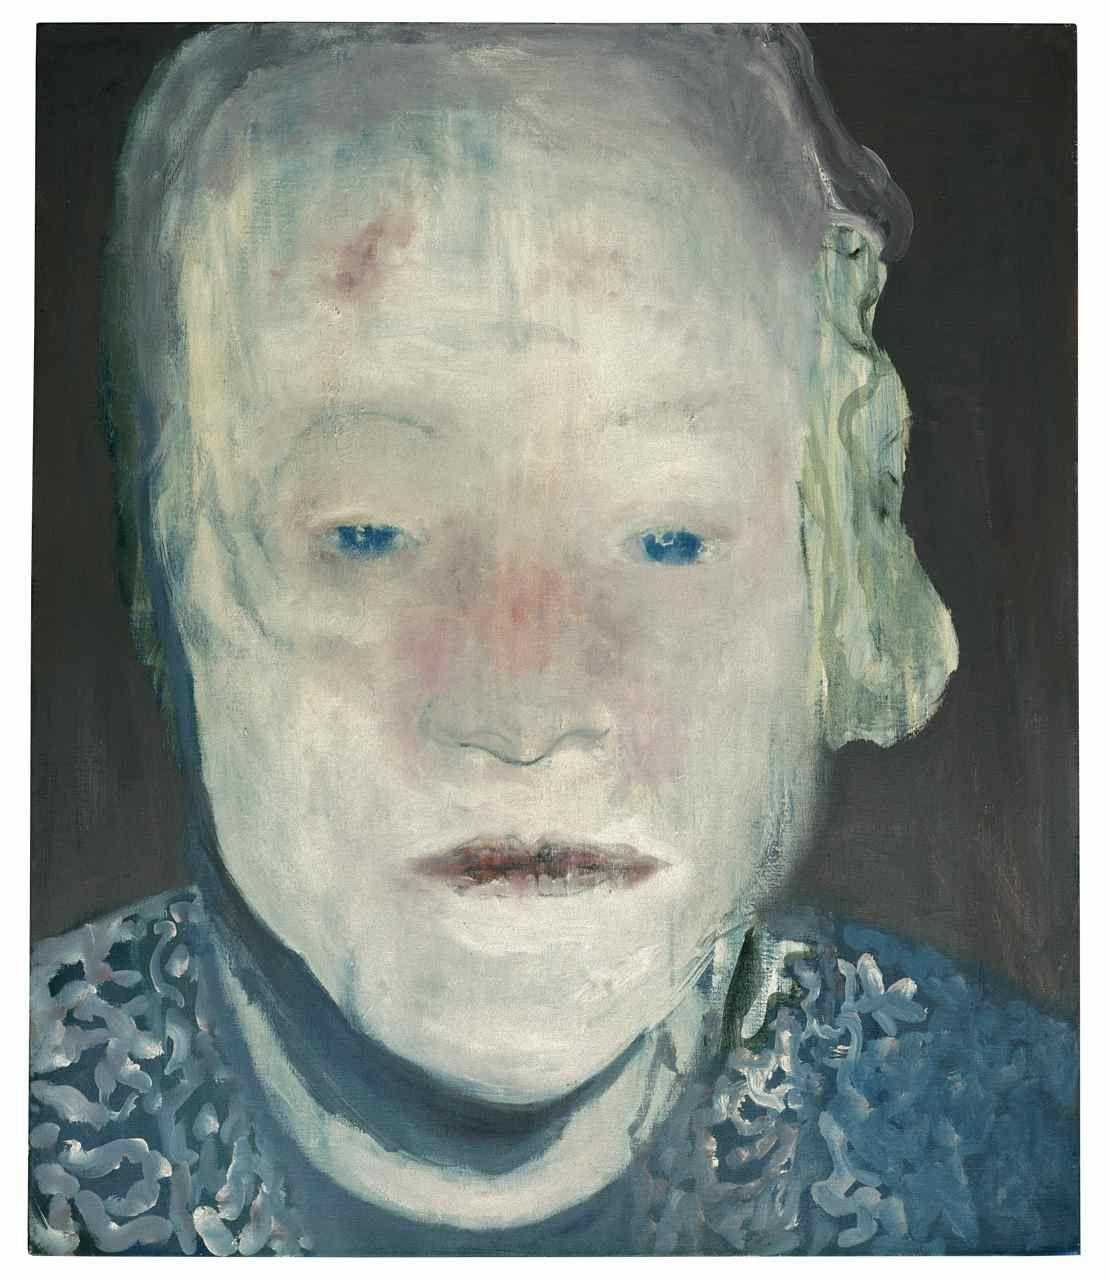 Marlene Dumas, The White Disease, 1985, oil on canvas, 49 3/16 x 41 5/16 in., Private Collection, © 2008 Marlene Dumas